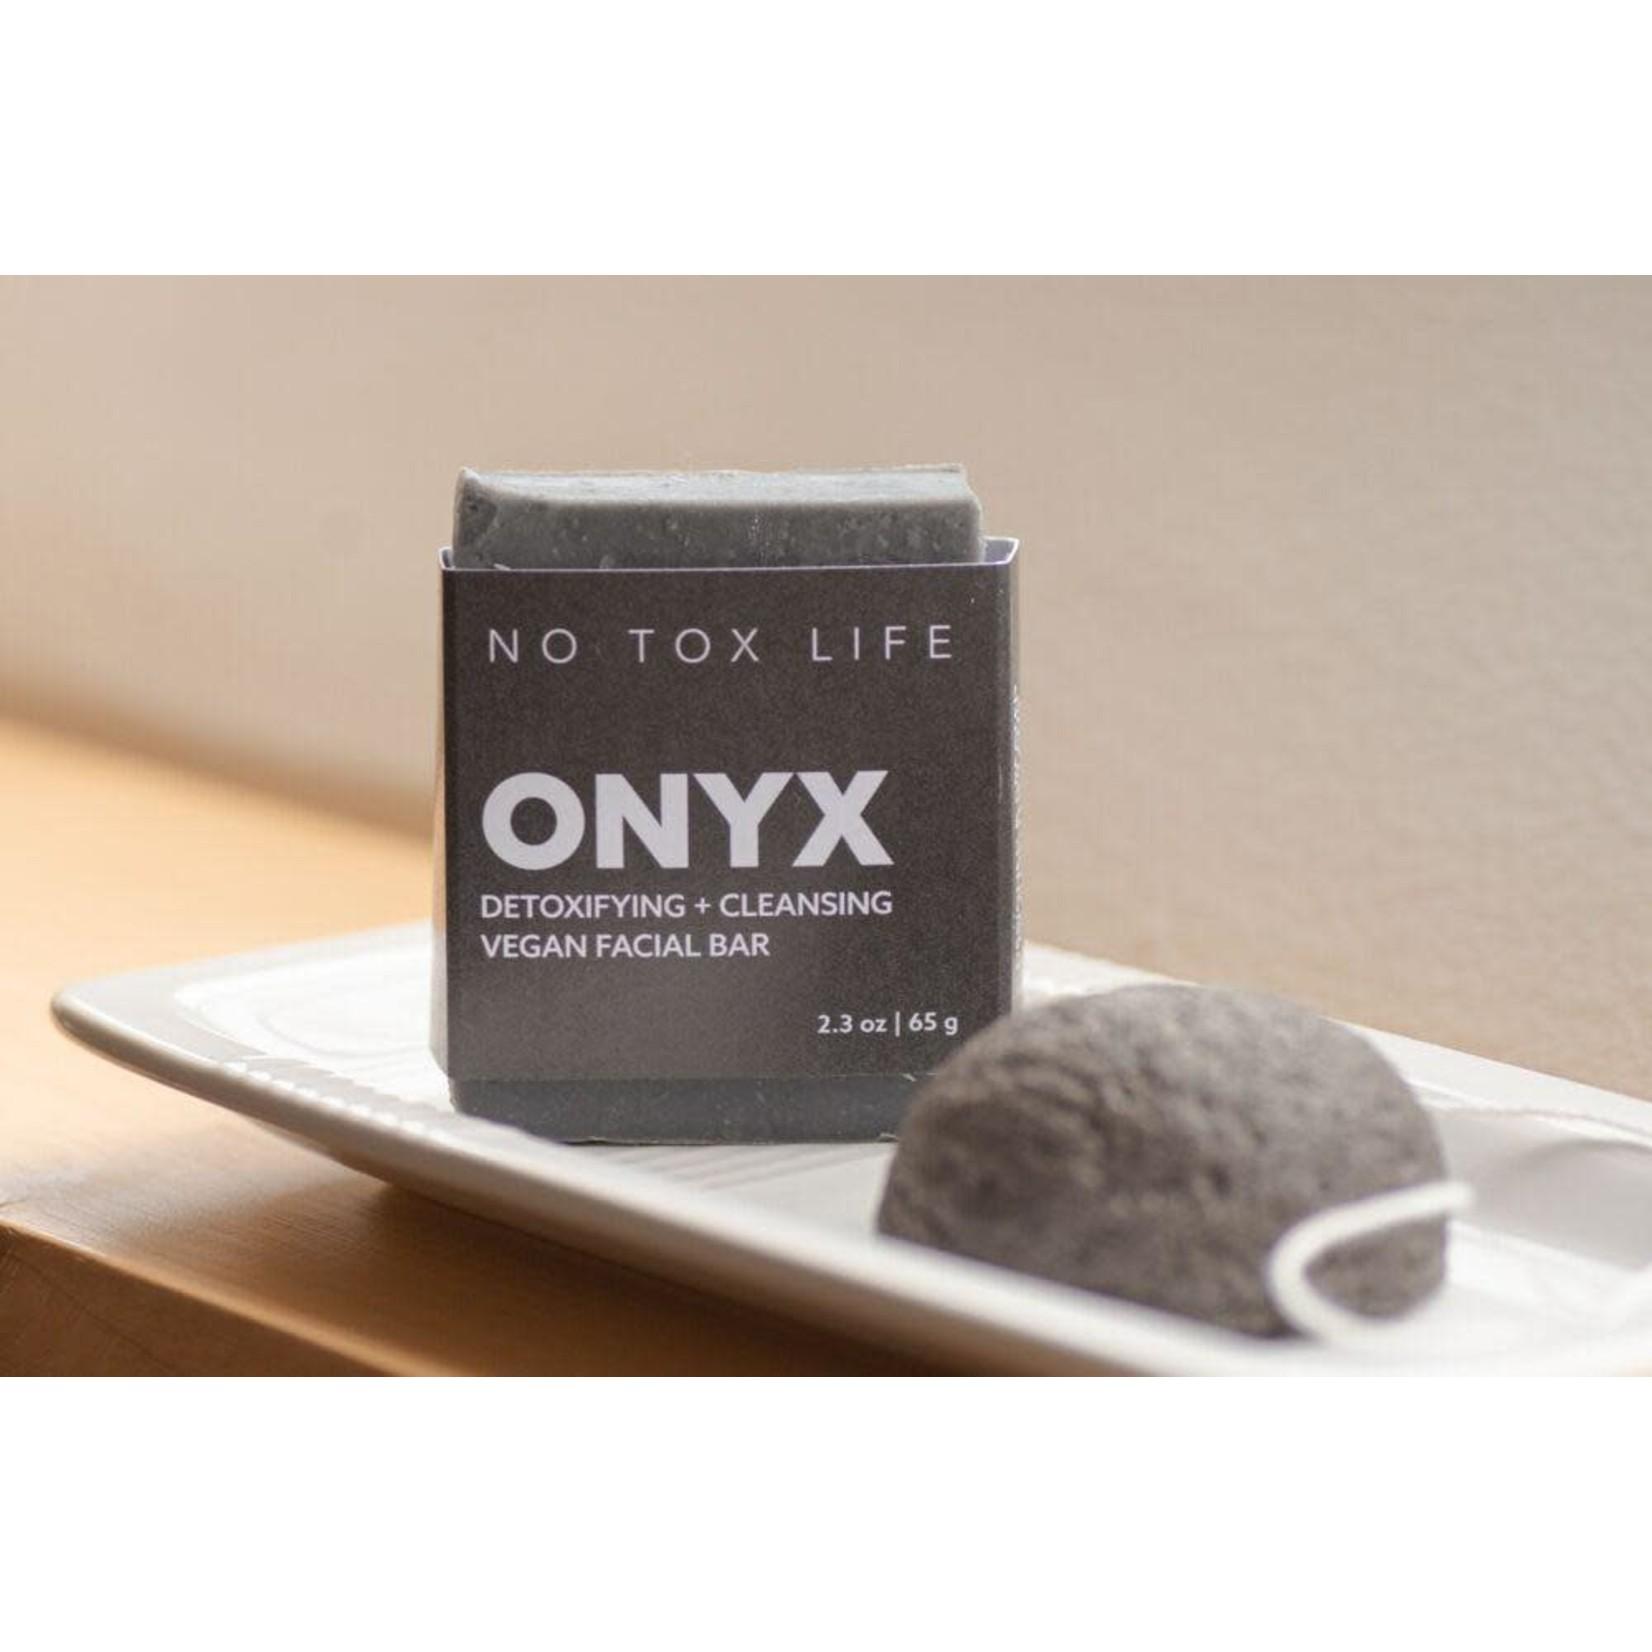 NO TOX LIFE Onyx Detoxifying Charcoal Cleansing Bar